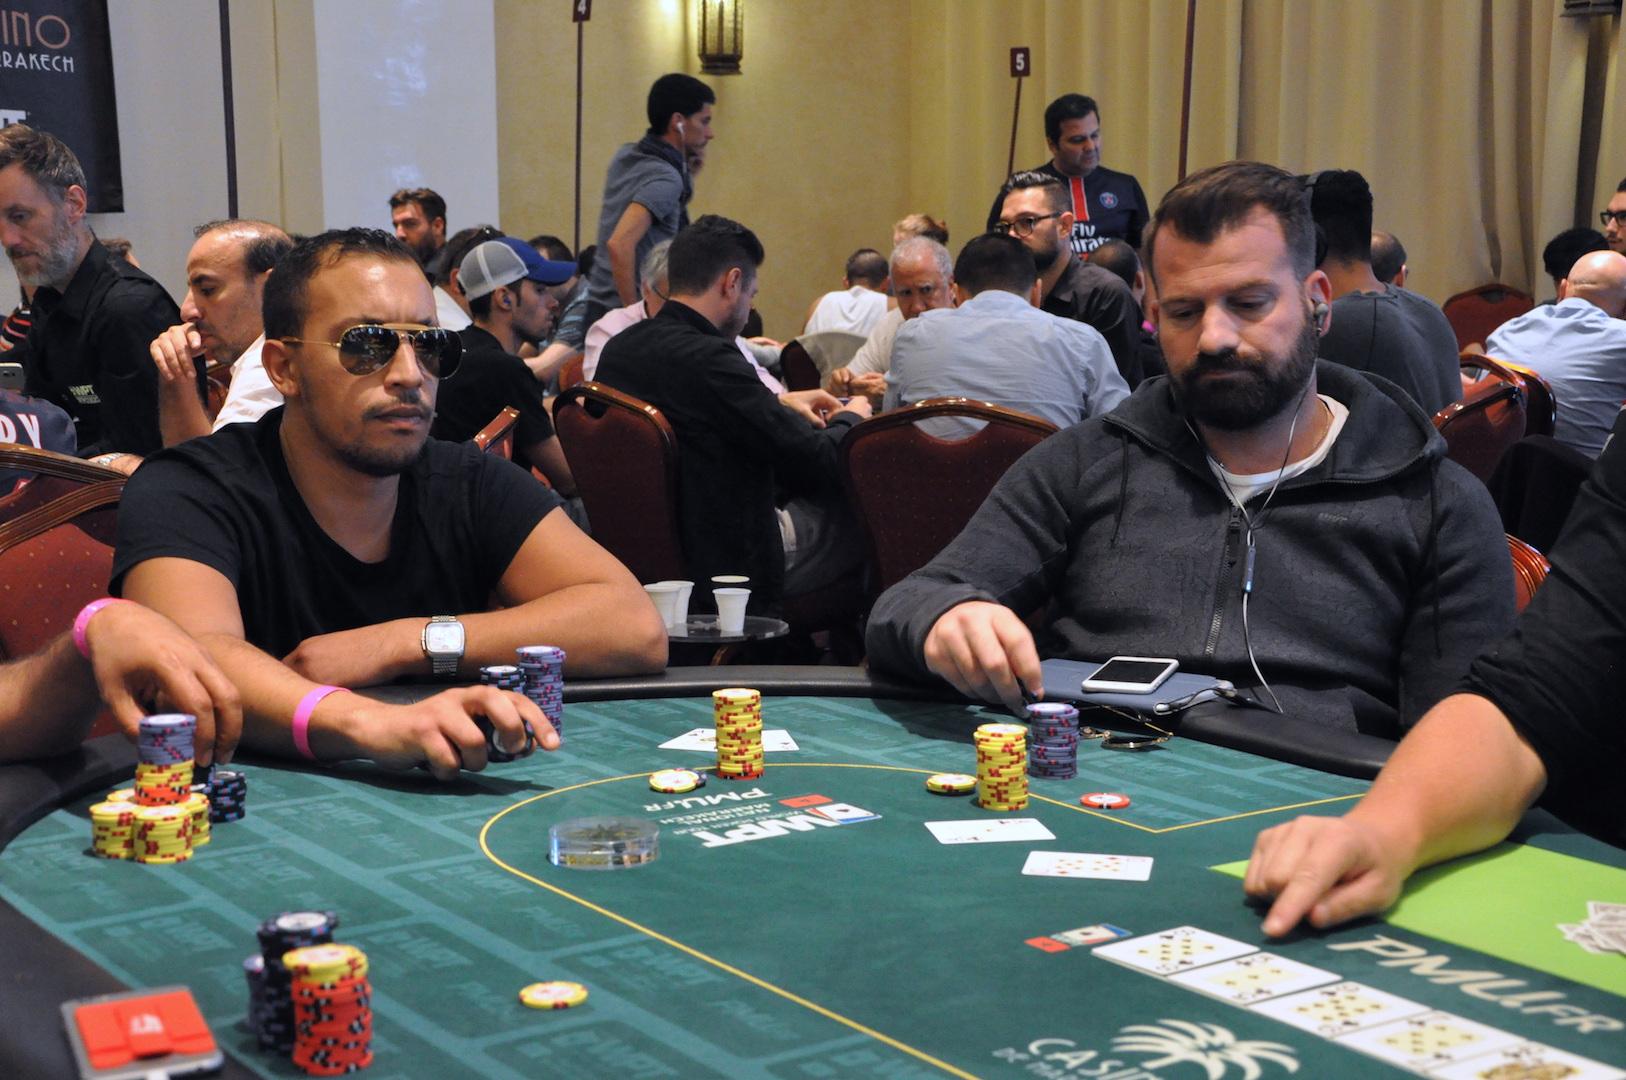 Rockets poker raid stop entry to casino singapore